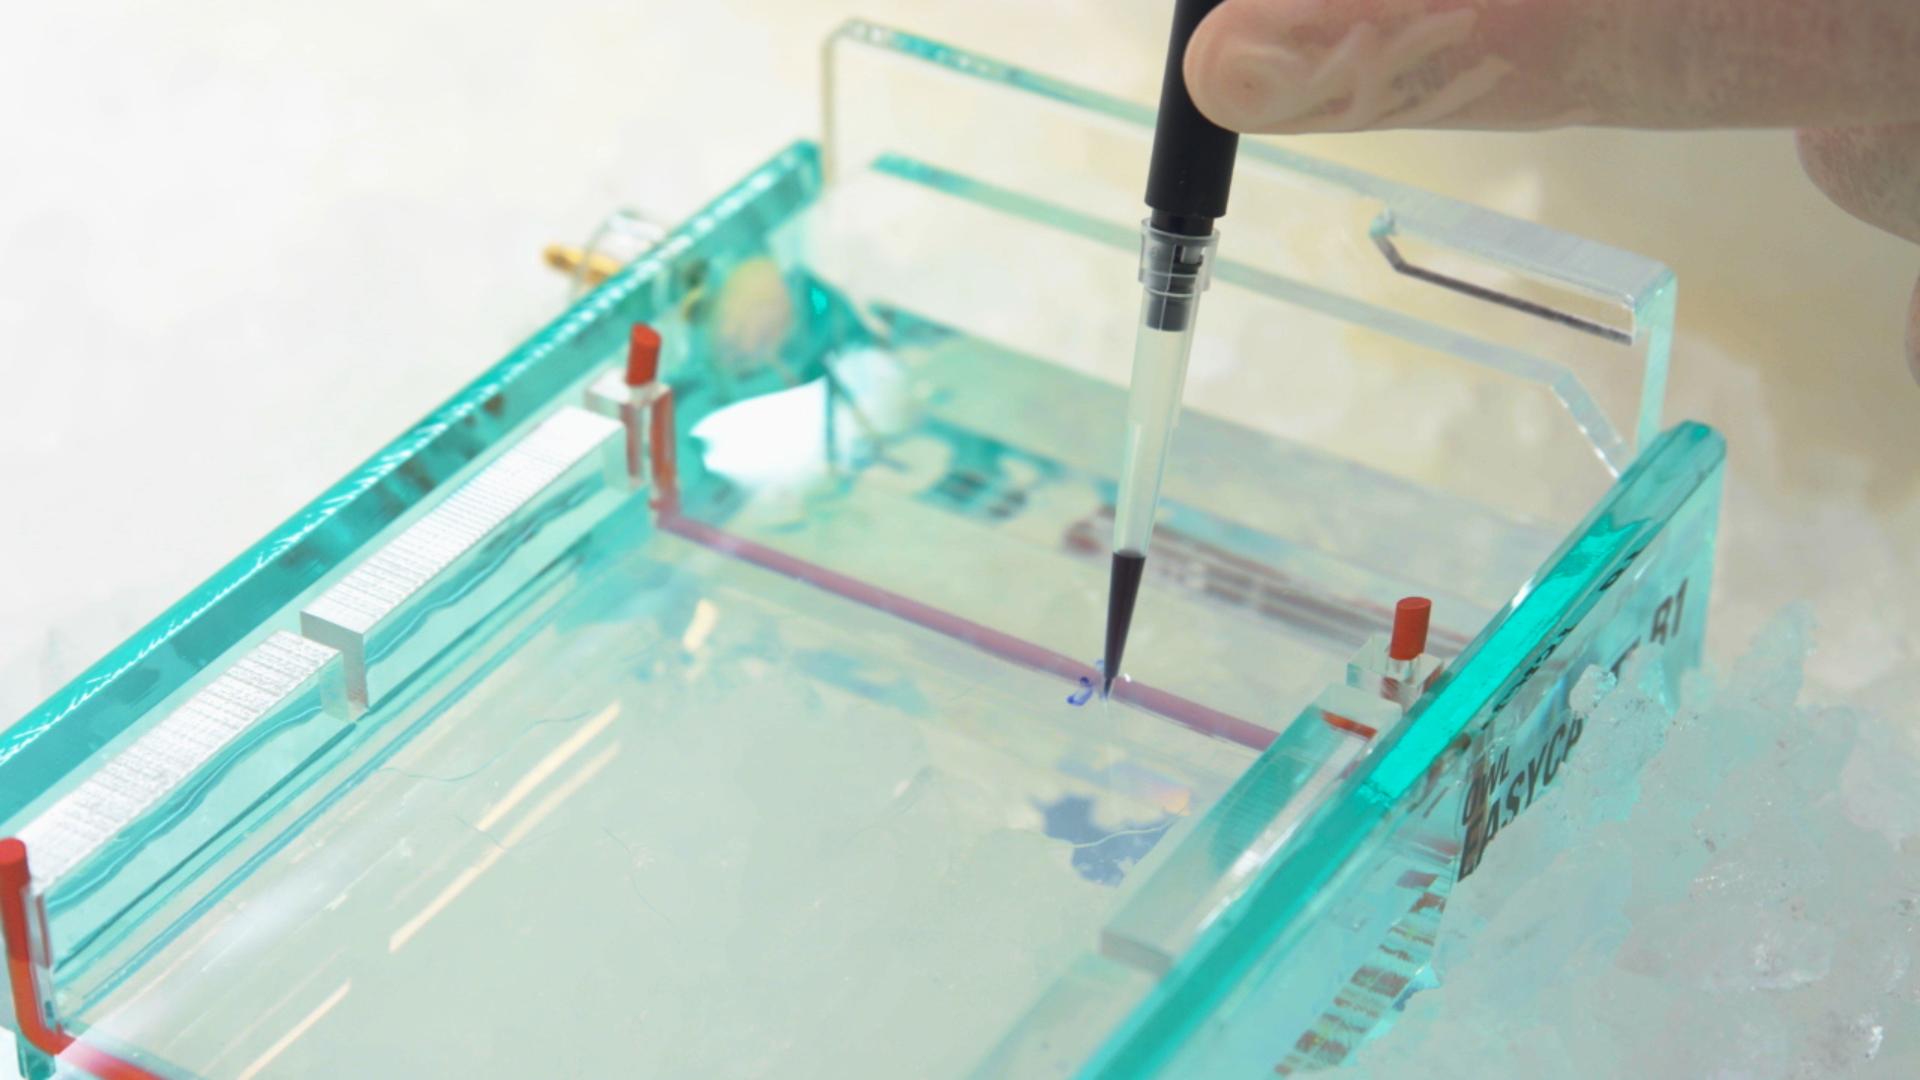 Asamblea de nanobarras de oro en Metamolecules plasmónica quirales mediante plantillas de Origami de ADN thumbnail